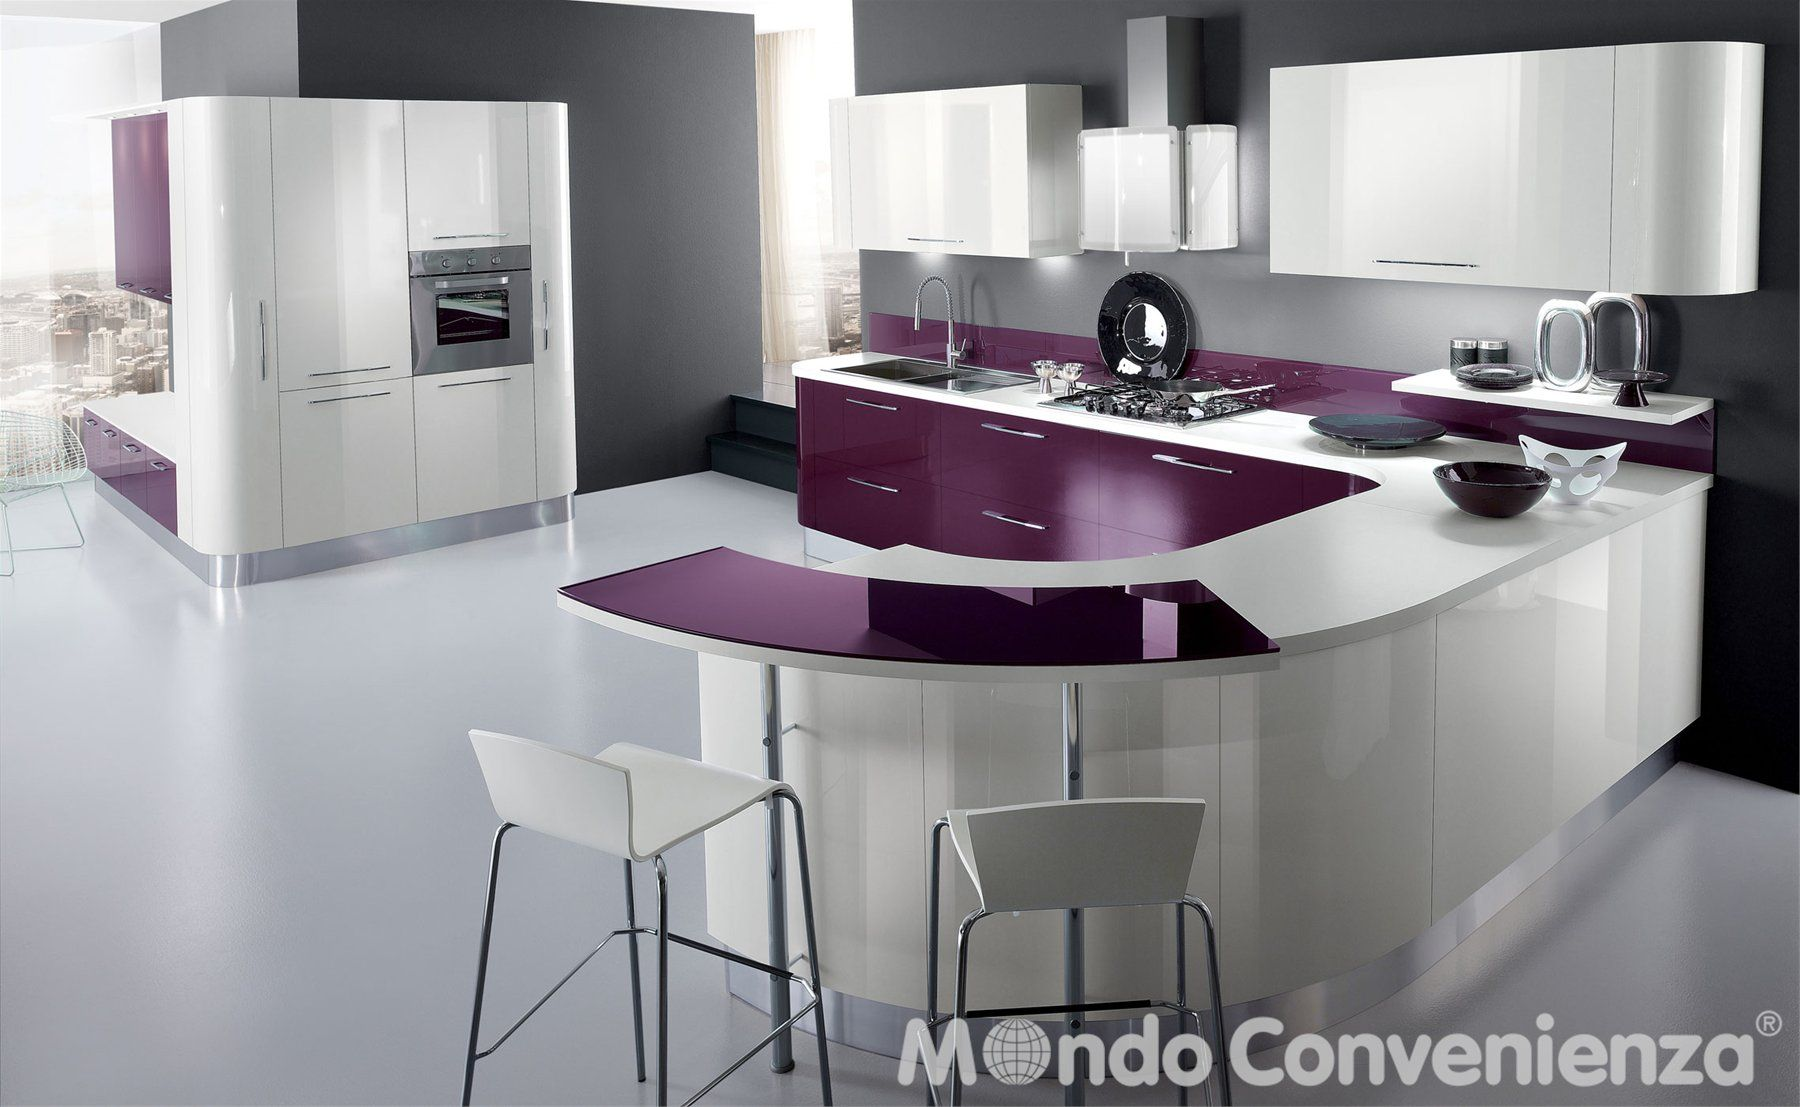 Ikea armadi ante scorrevoli - Nuove cucine ikea ...